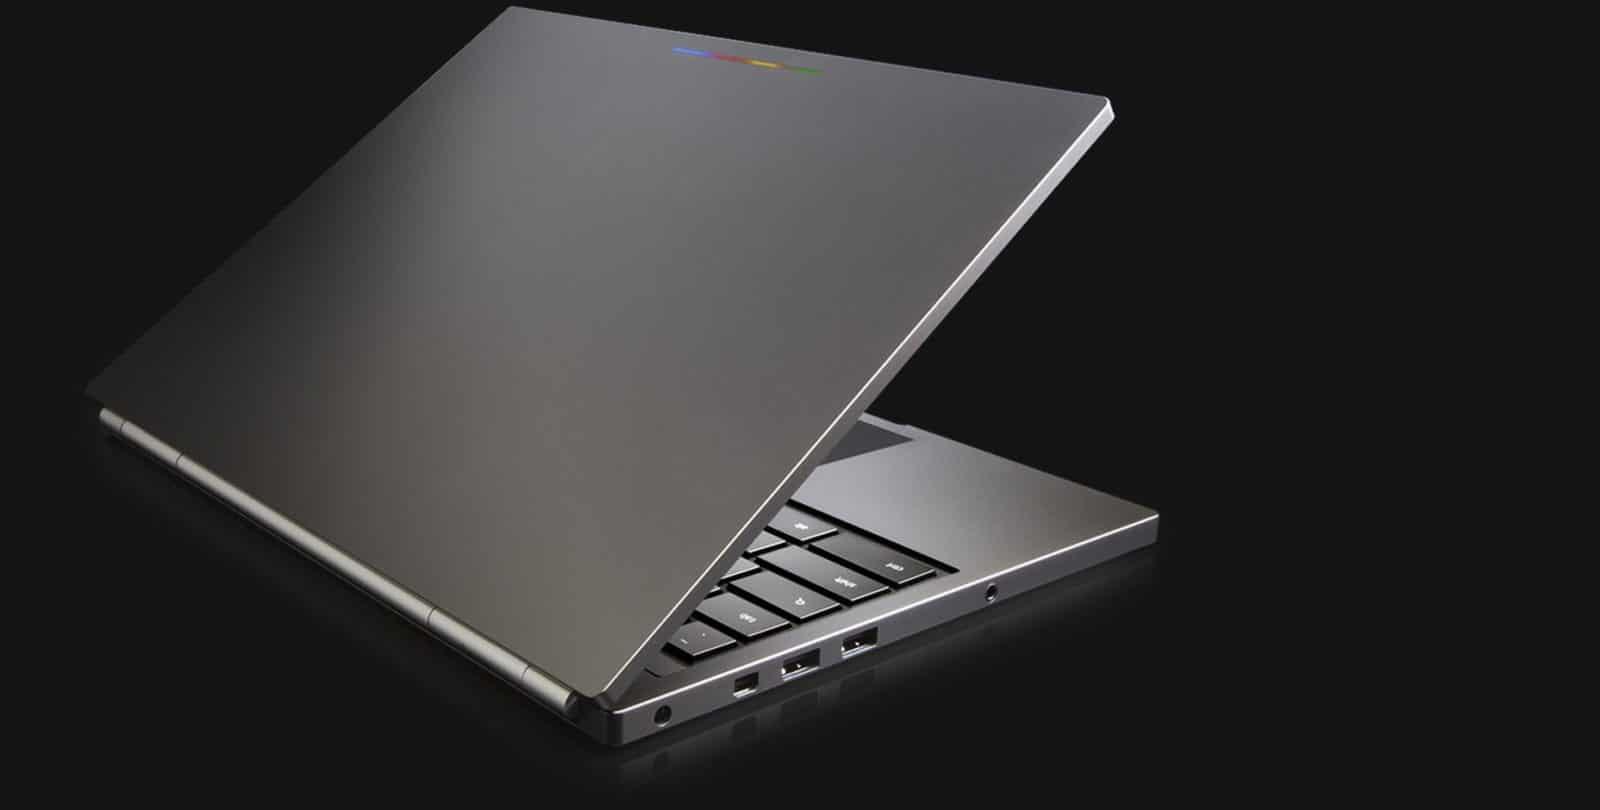 Google-Chromebook-Pixel - 1